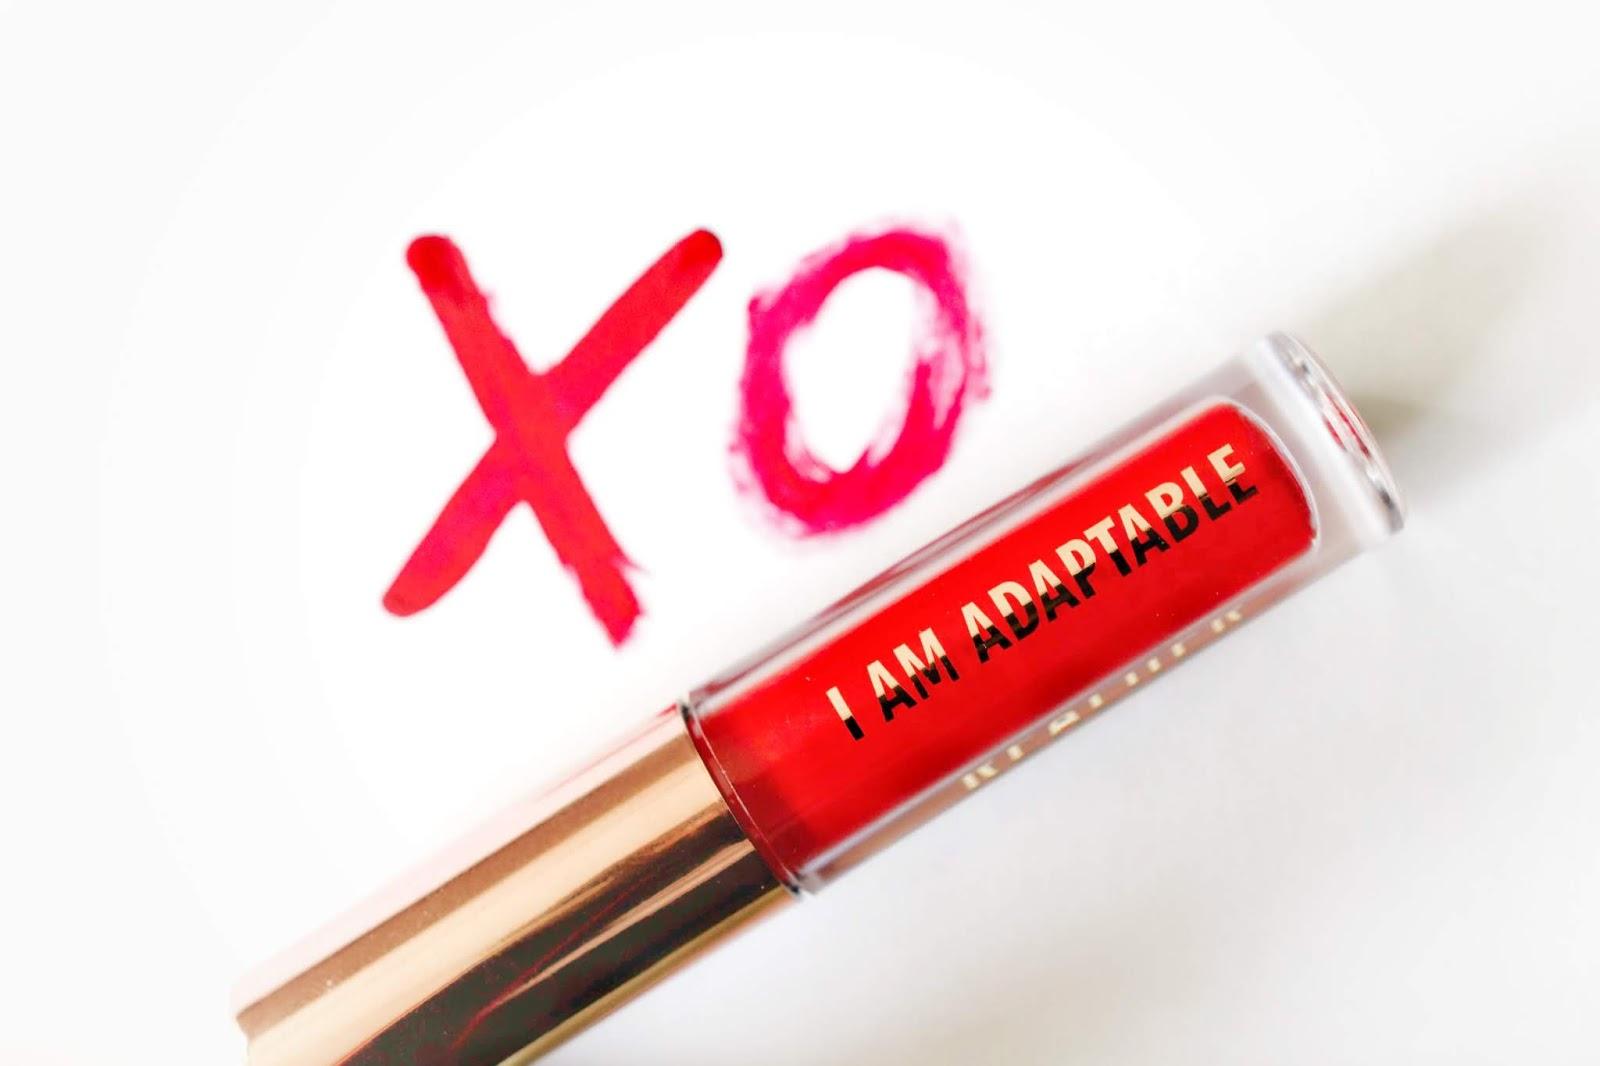 lipstick i am adaptable red lip